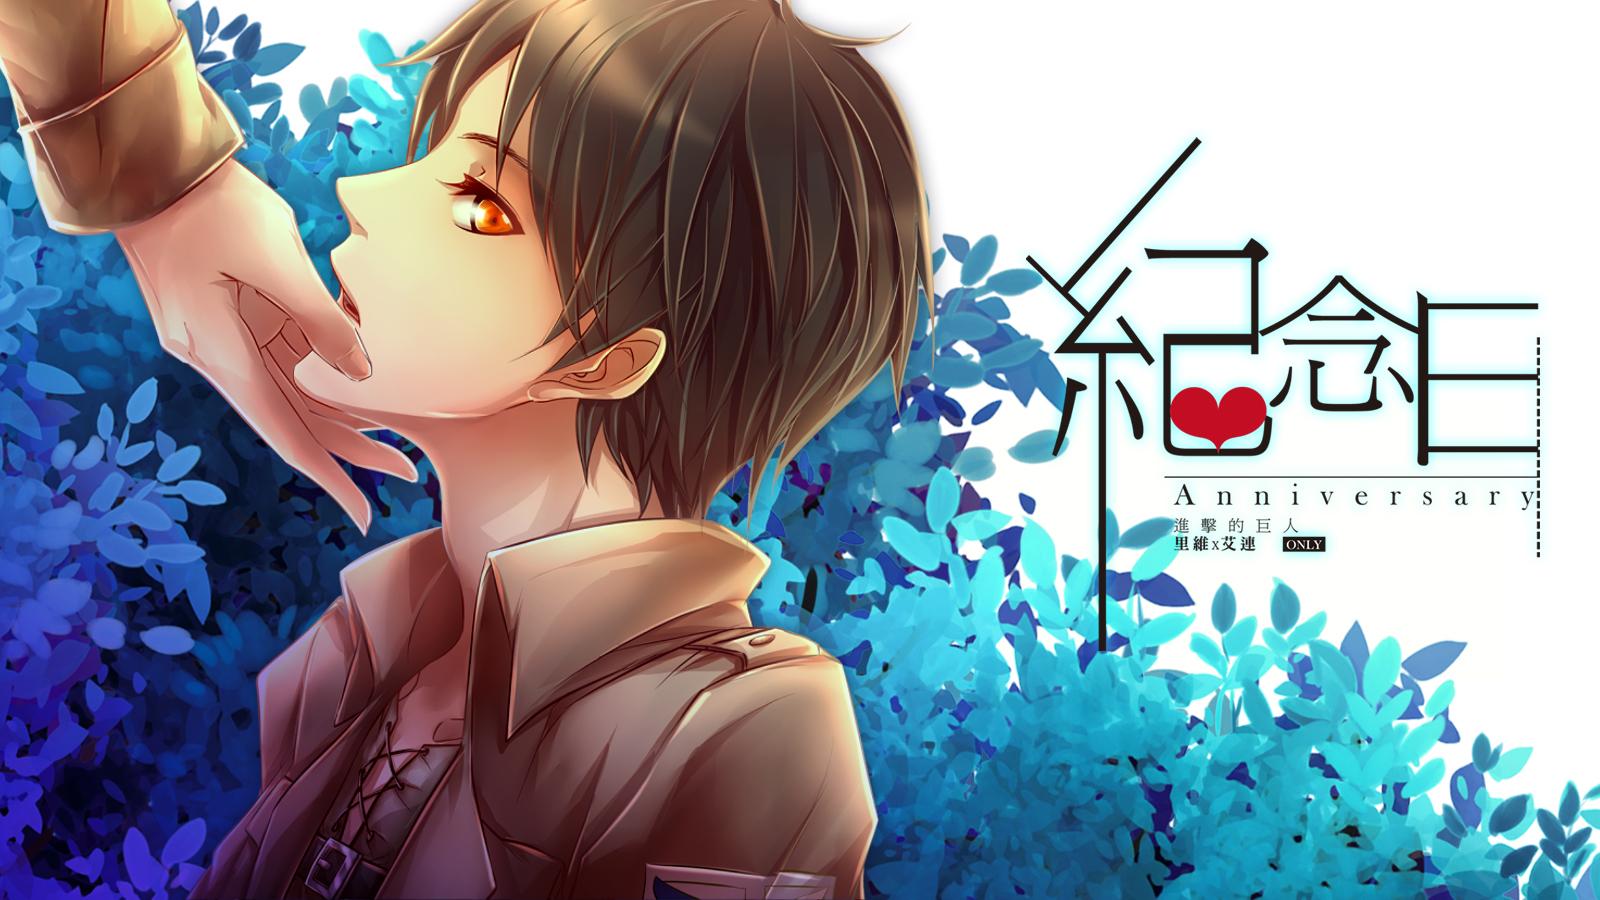 Eren Jaeger Eren Yeager Attack On Titan Wallpaper 1622530 Zerochan Anime Image Board